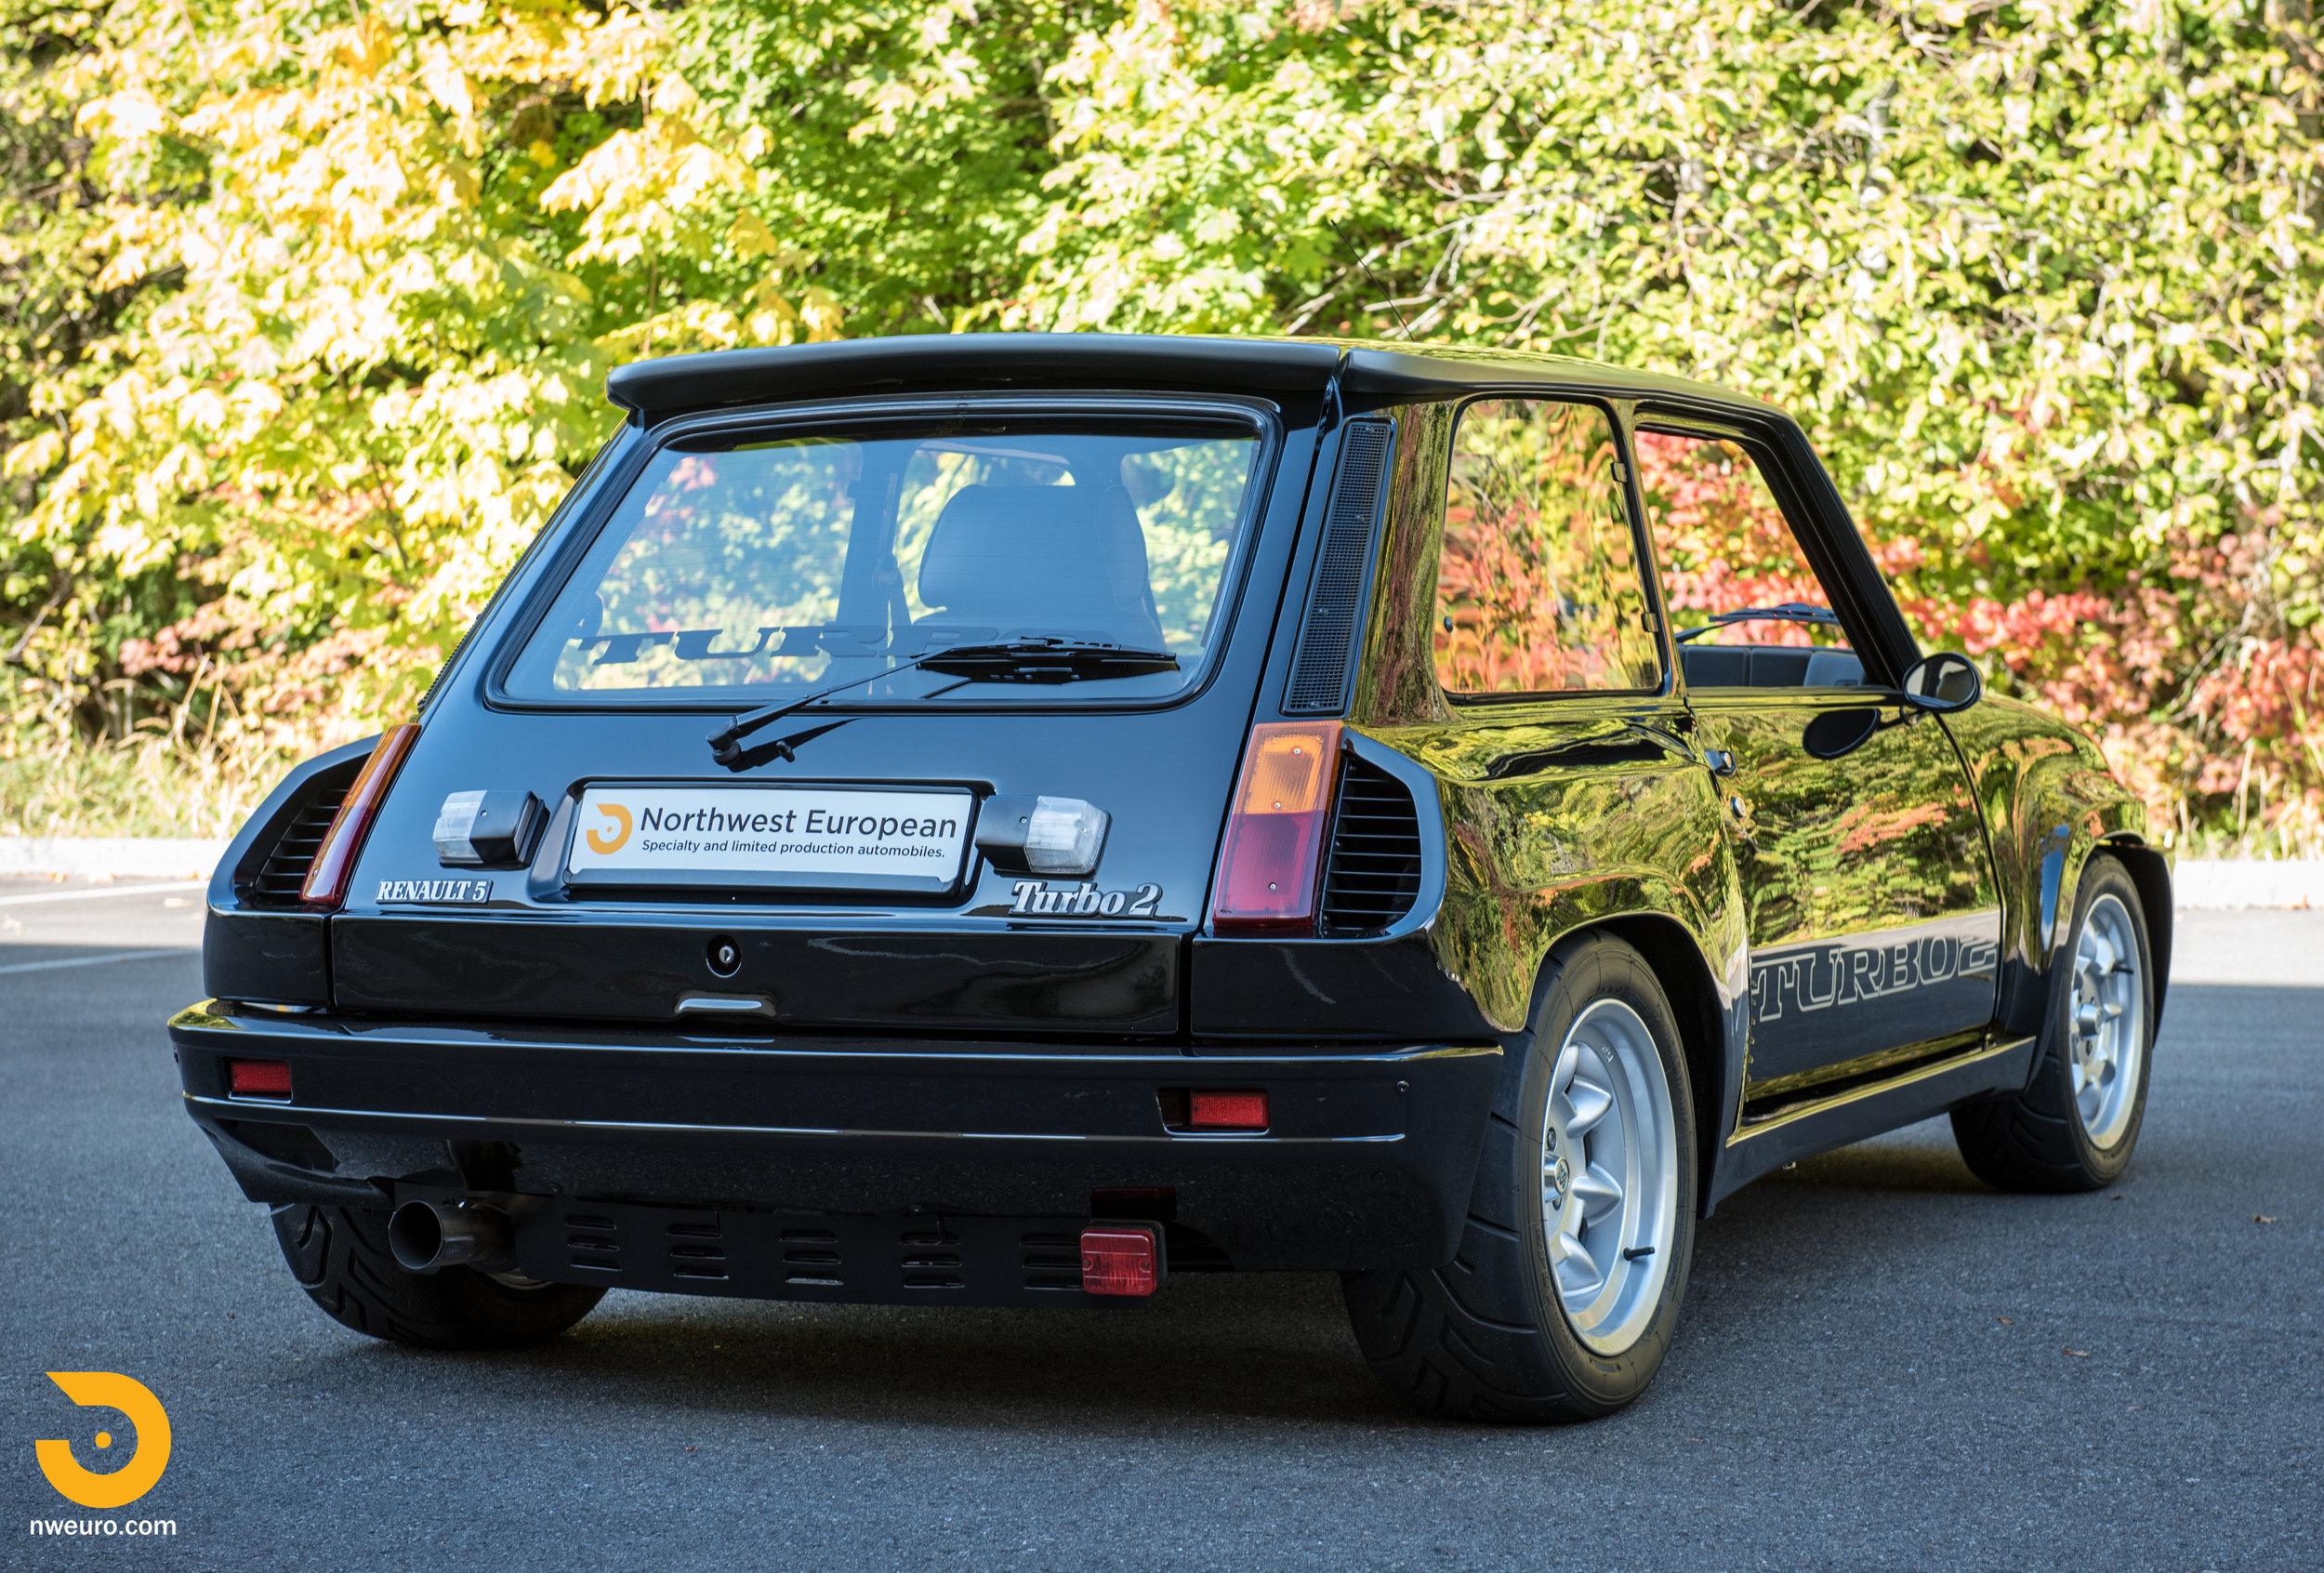 1983 Renault R5 Turbo 2 Black-58.jpg